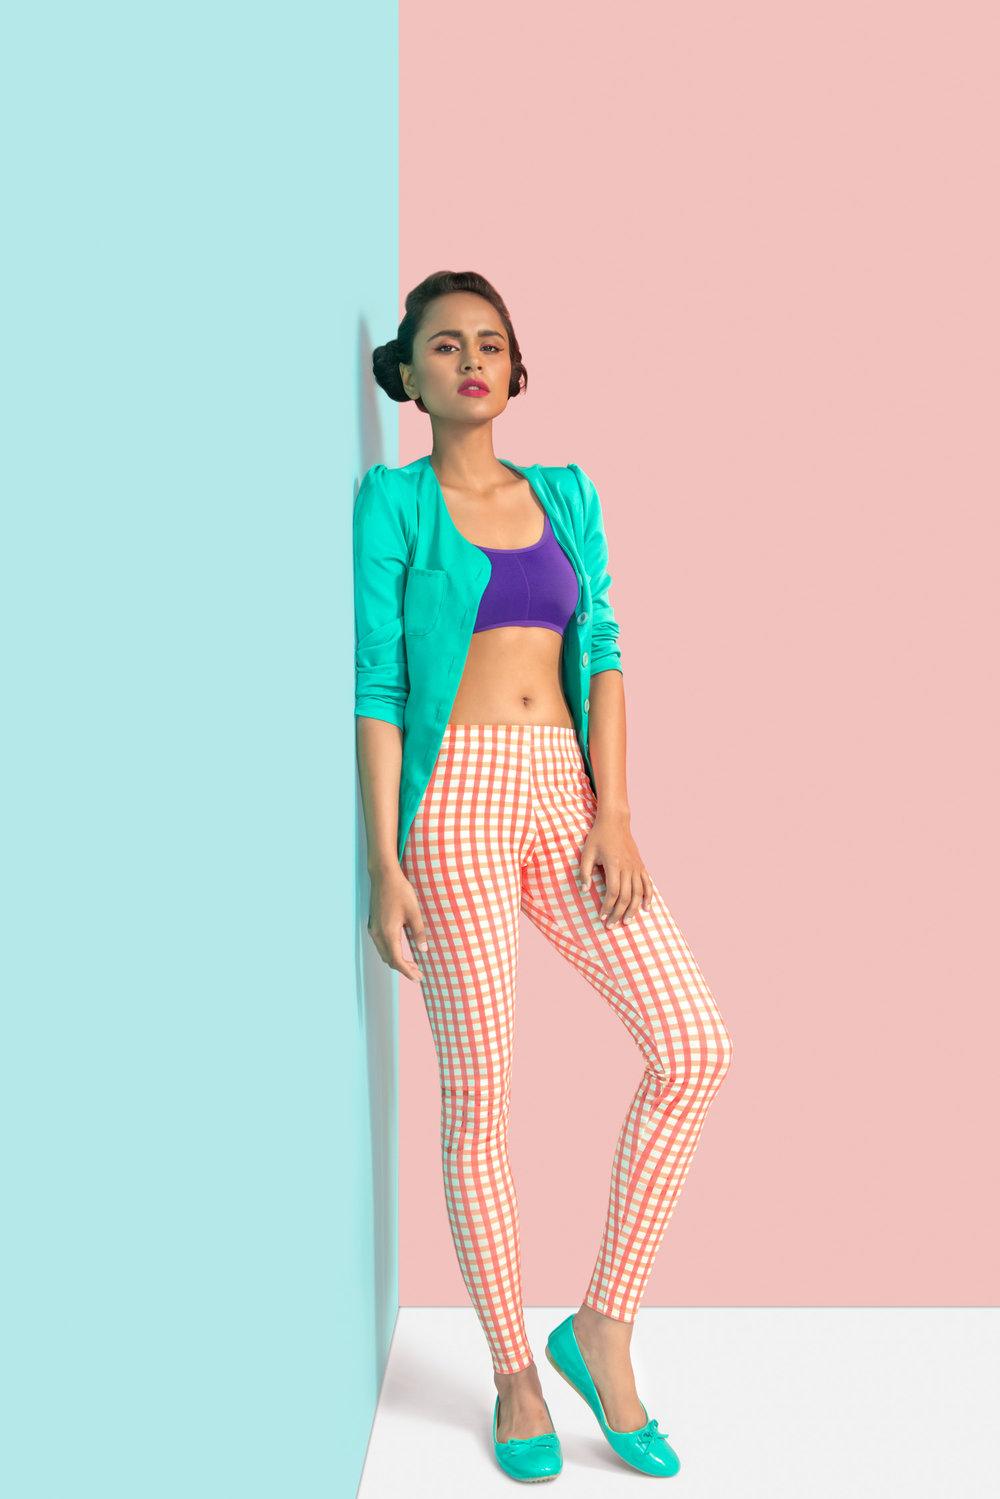 1_Chhandak Pradhan-Fashion-Femorra-Brand Campaign.jpg